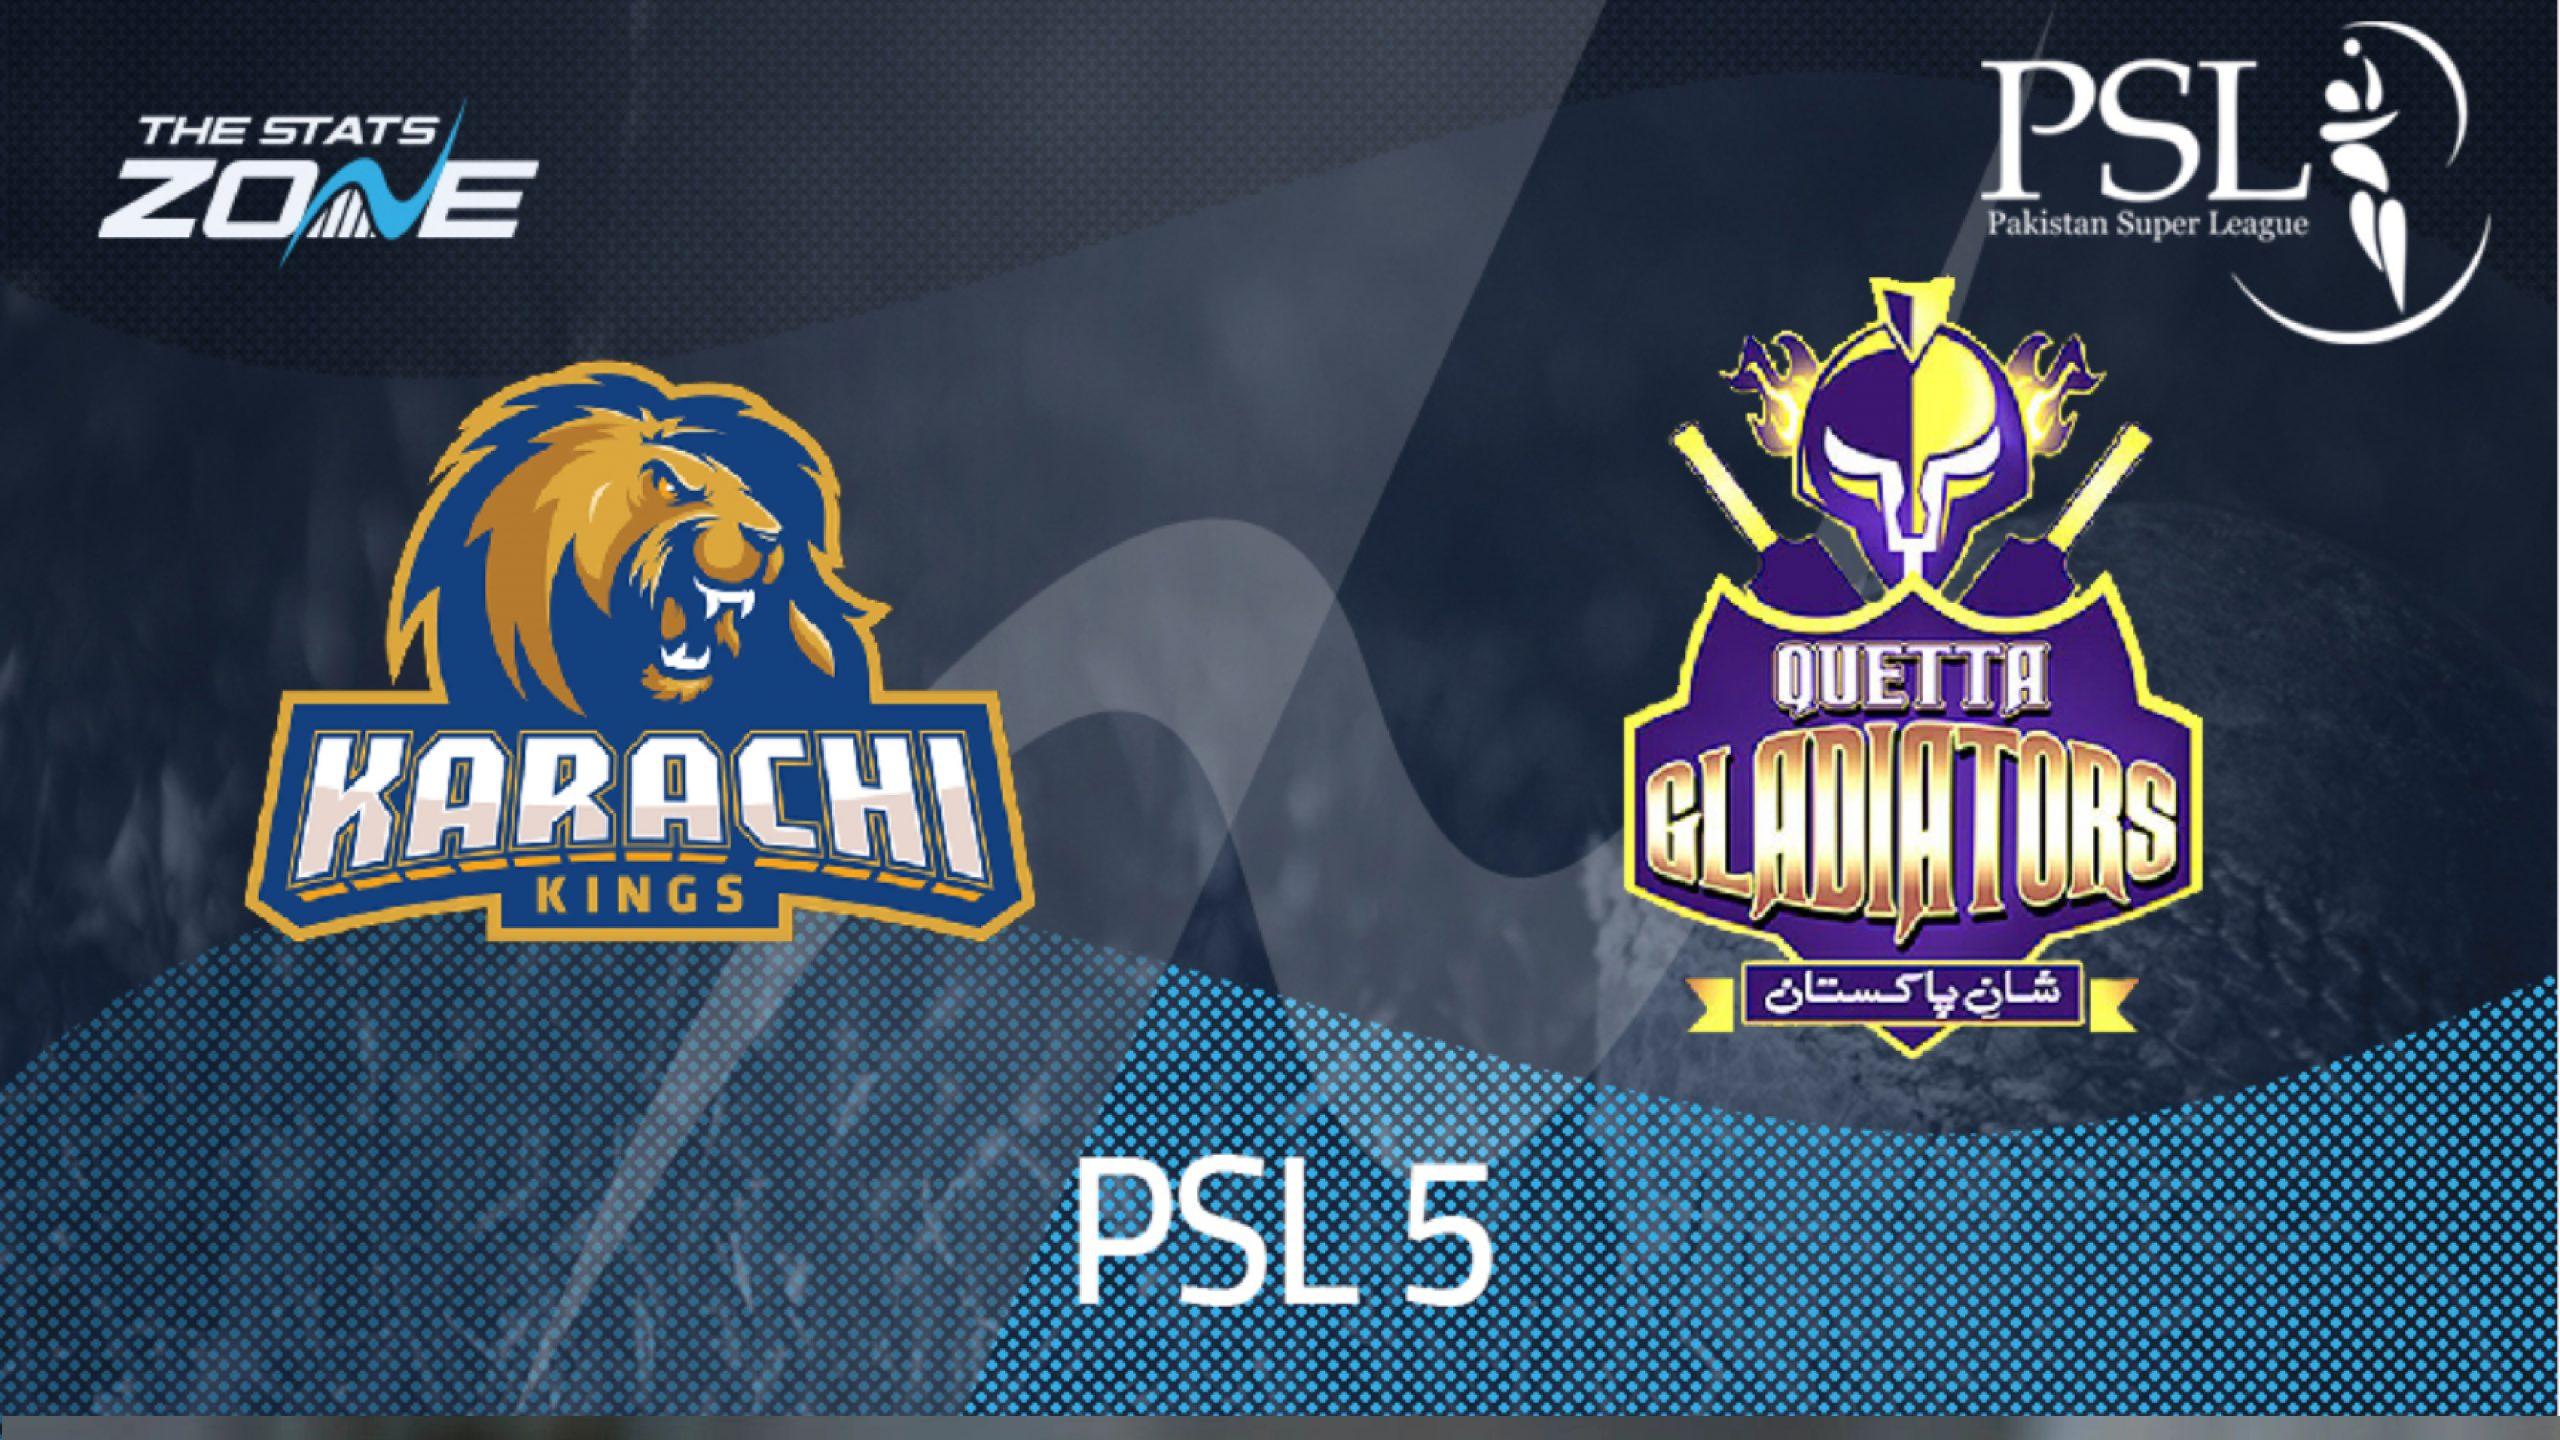 Karachi-kings-Quetta-gladiators